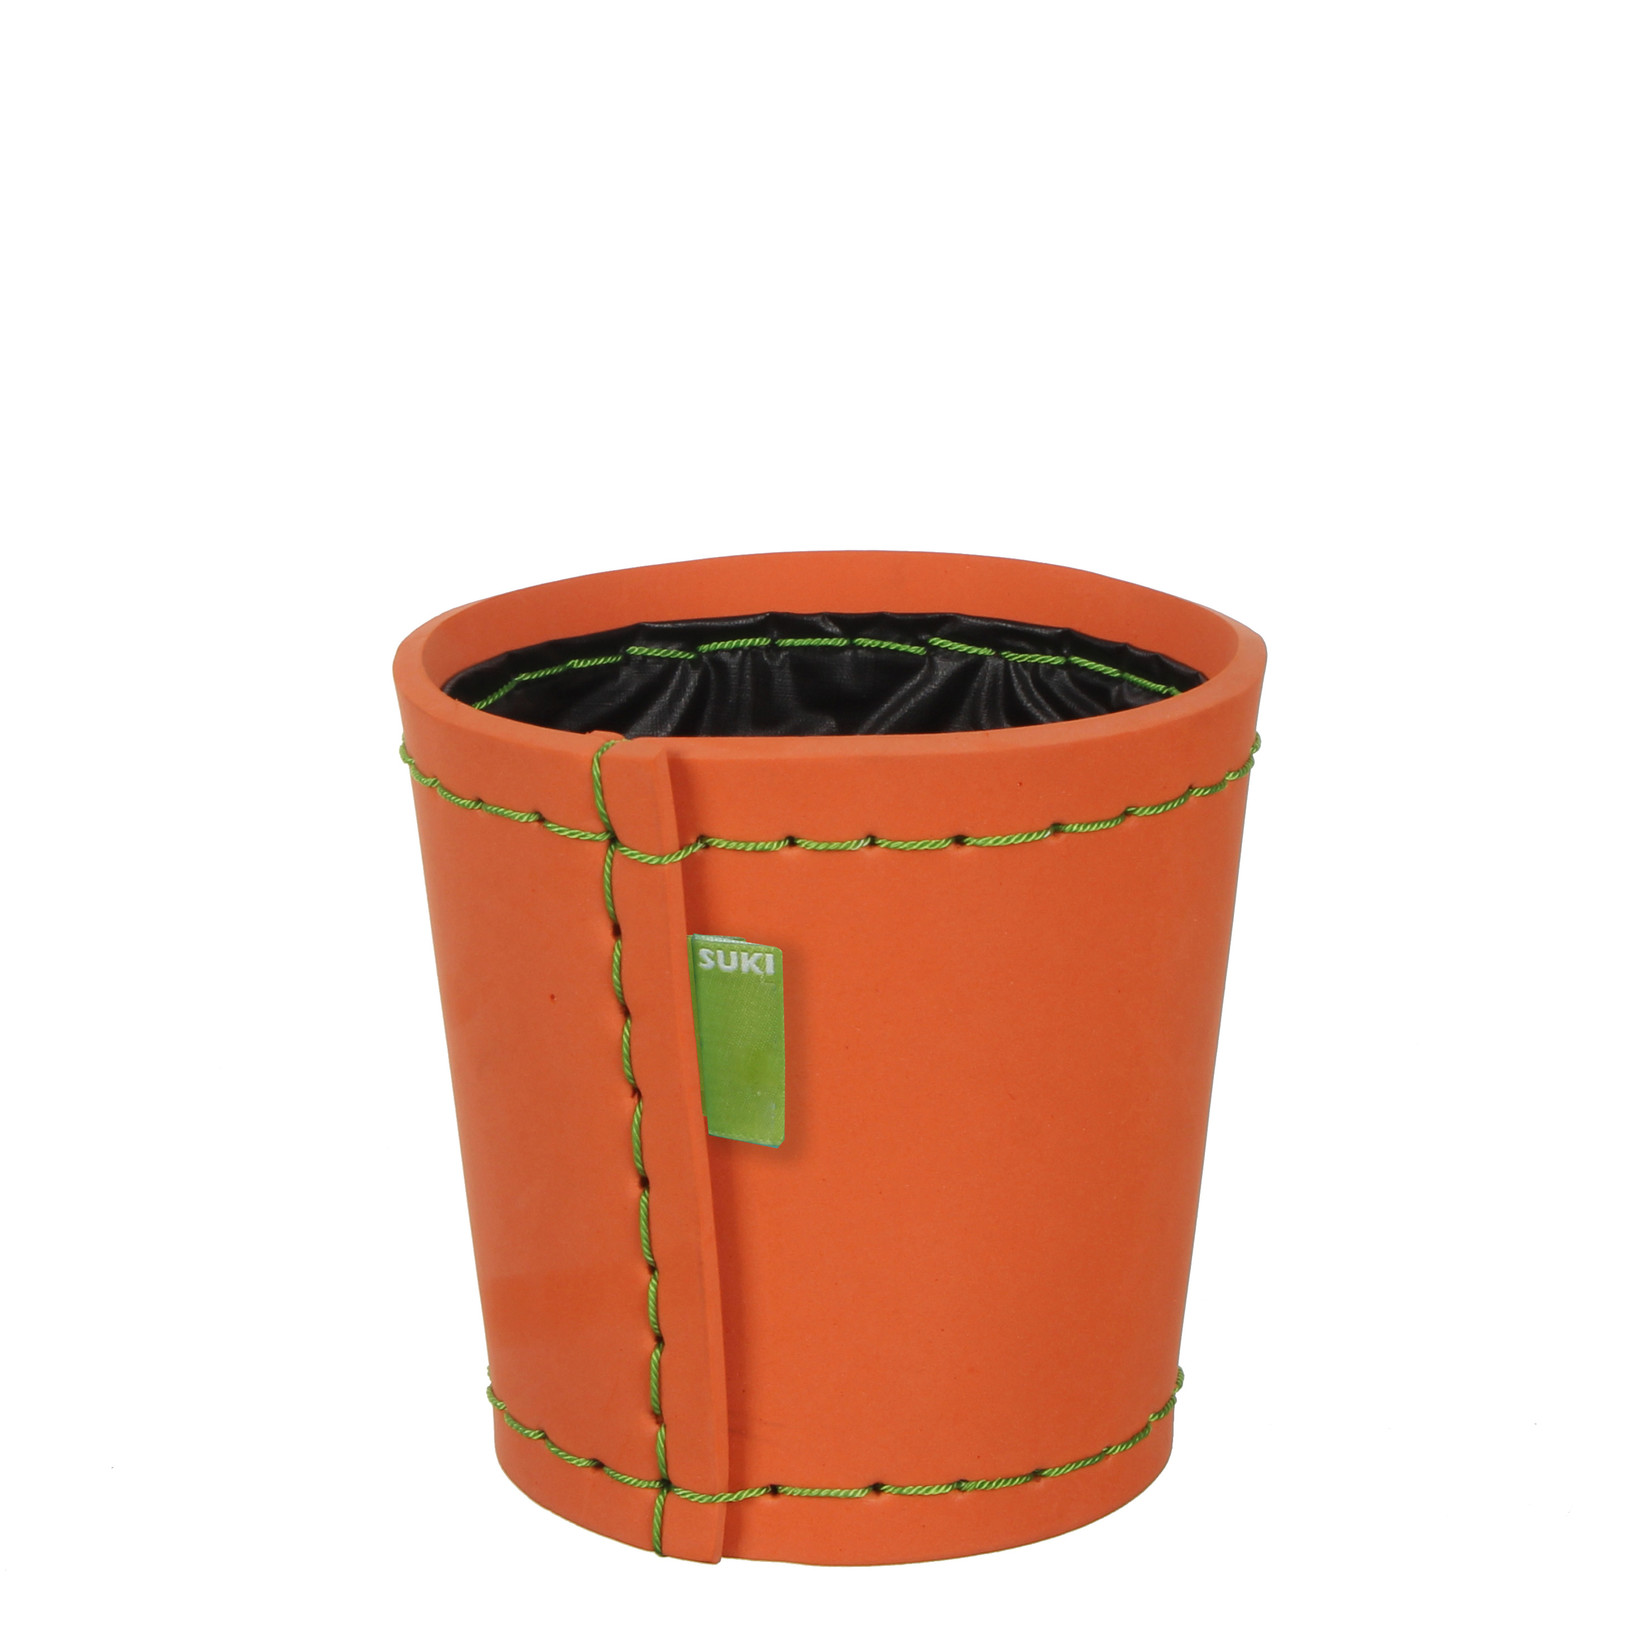 MiCa 153461 Pot rond Suki oranje